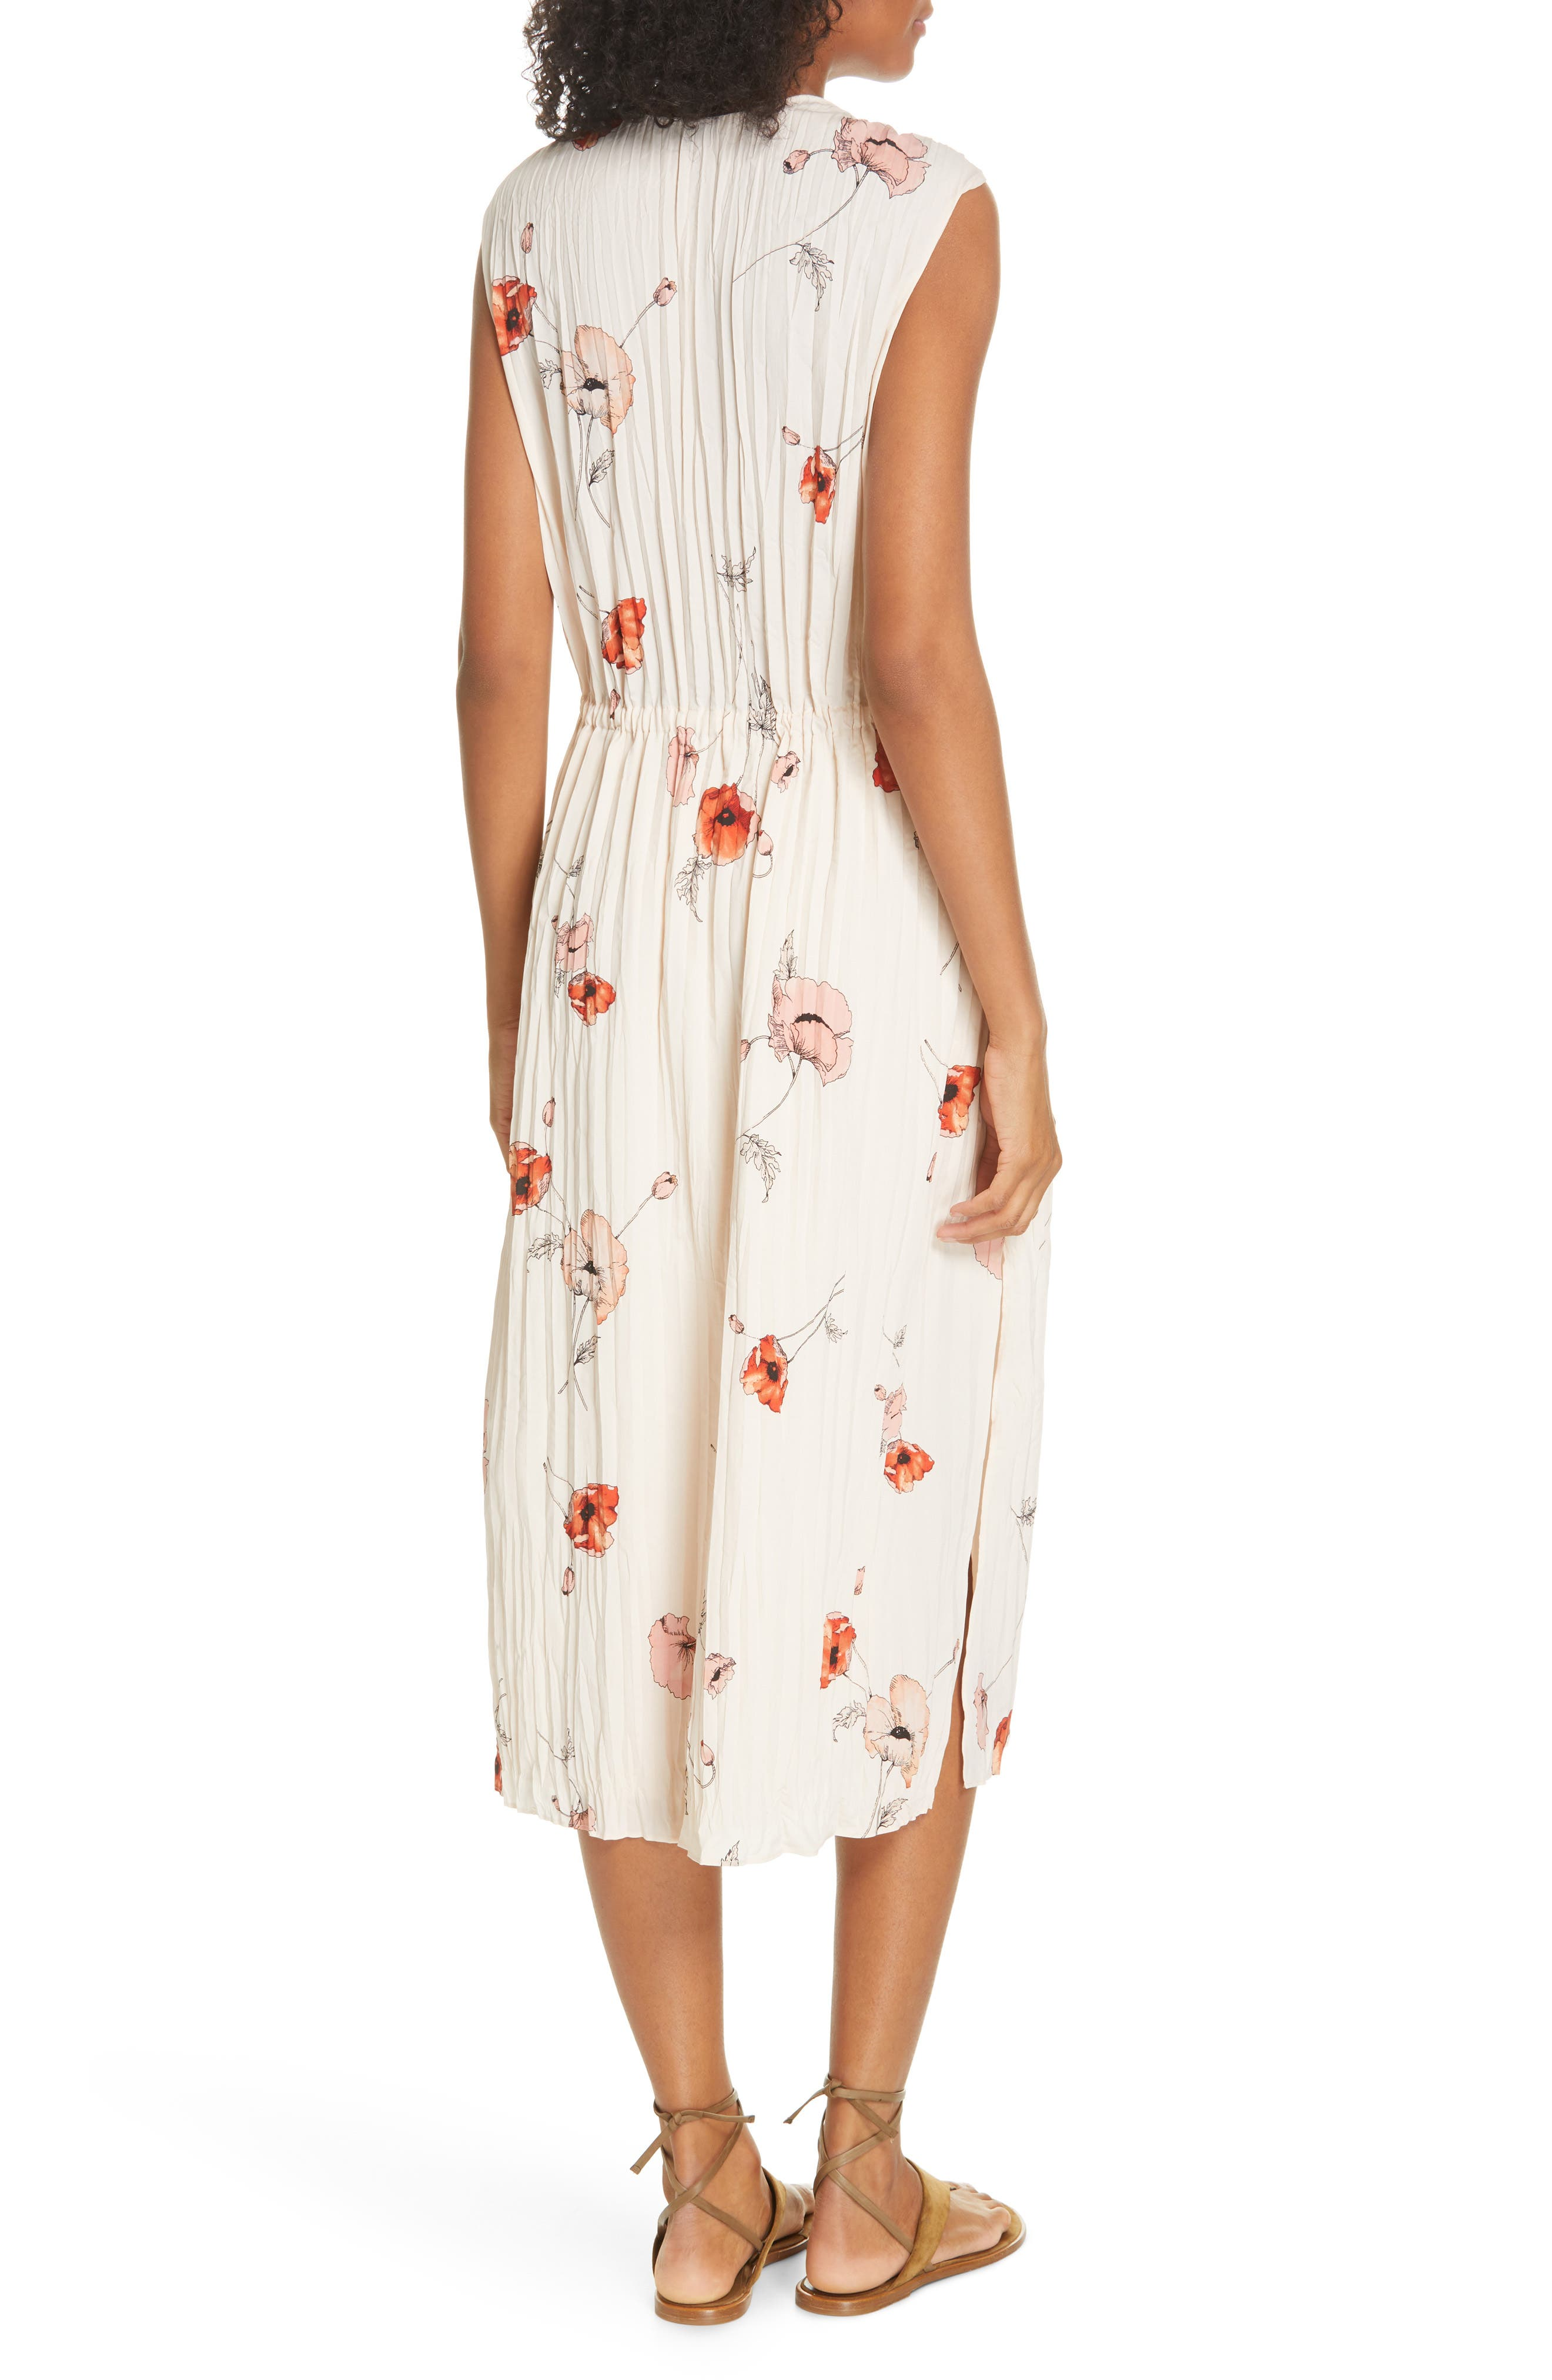 VINCE, Tossed Poppy Pleated Midi Dress, Alternate thumbnail 2, color, PALE BLUSH